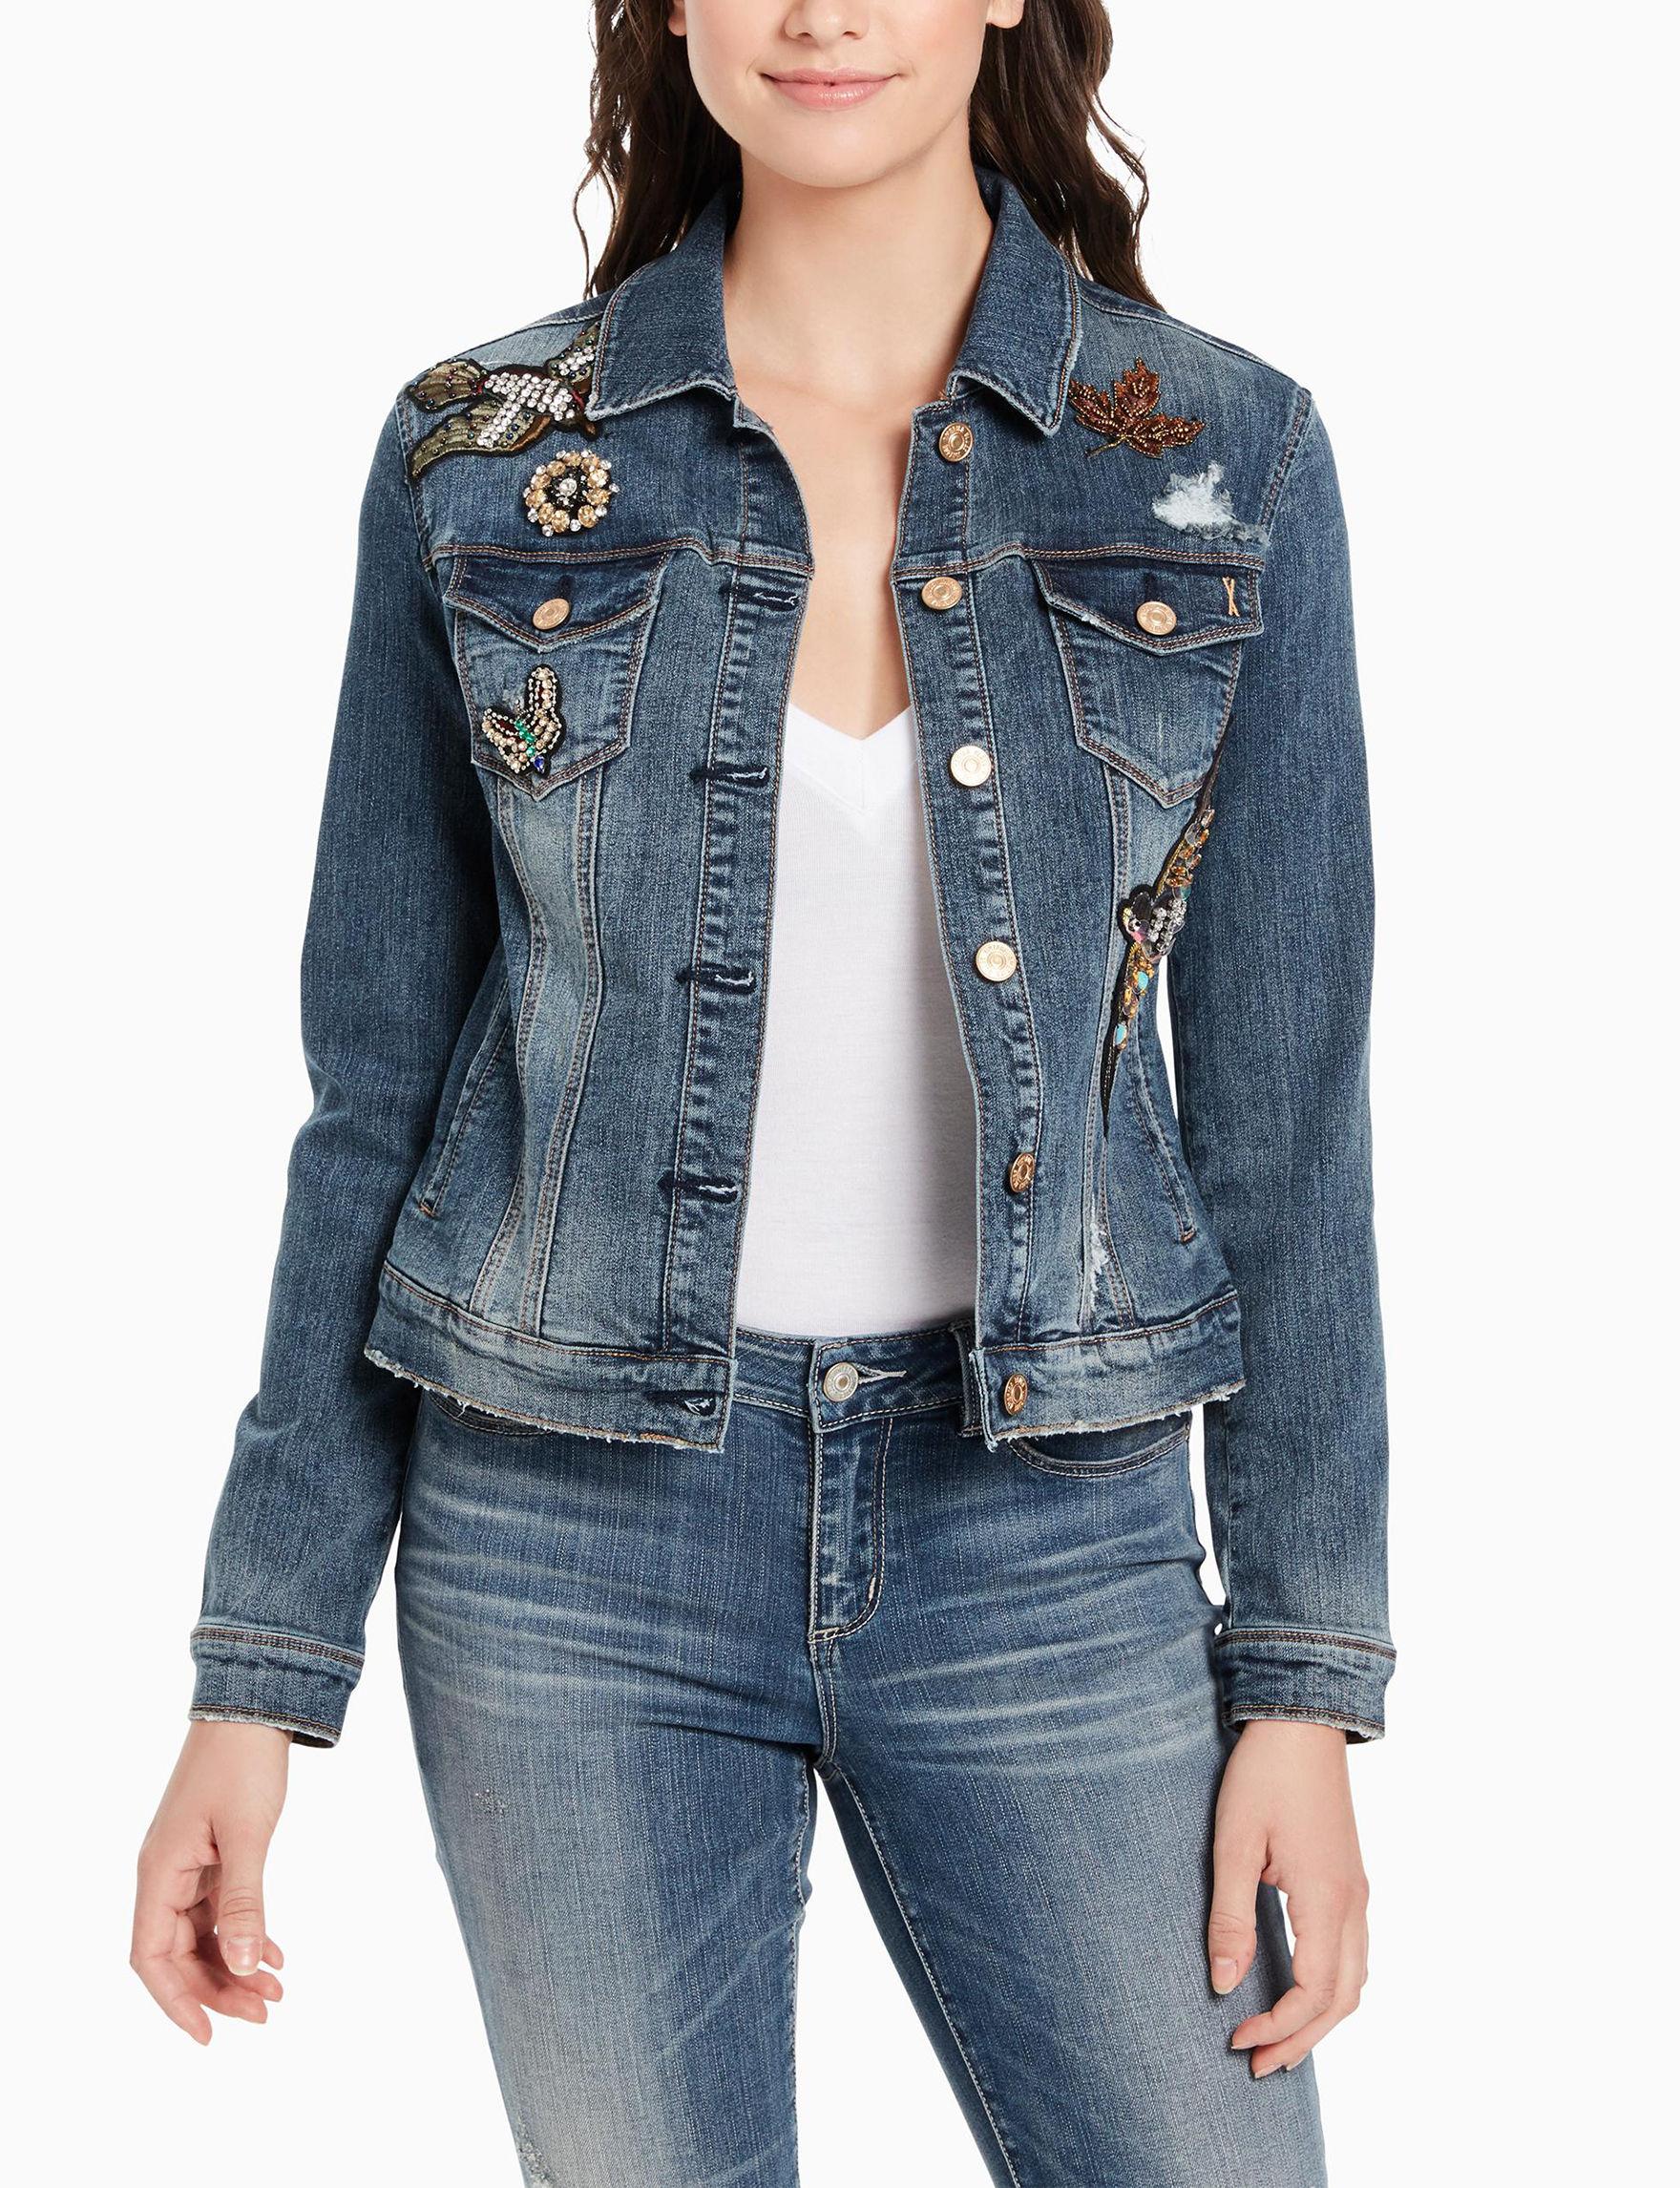 Vintage America Blues Blue Everyday & Casual Lightweight Jackets & Blazers